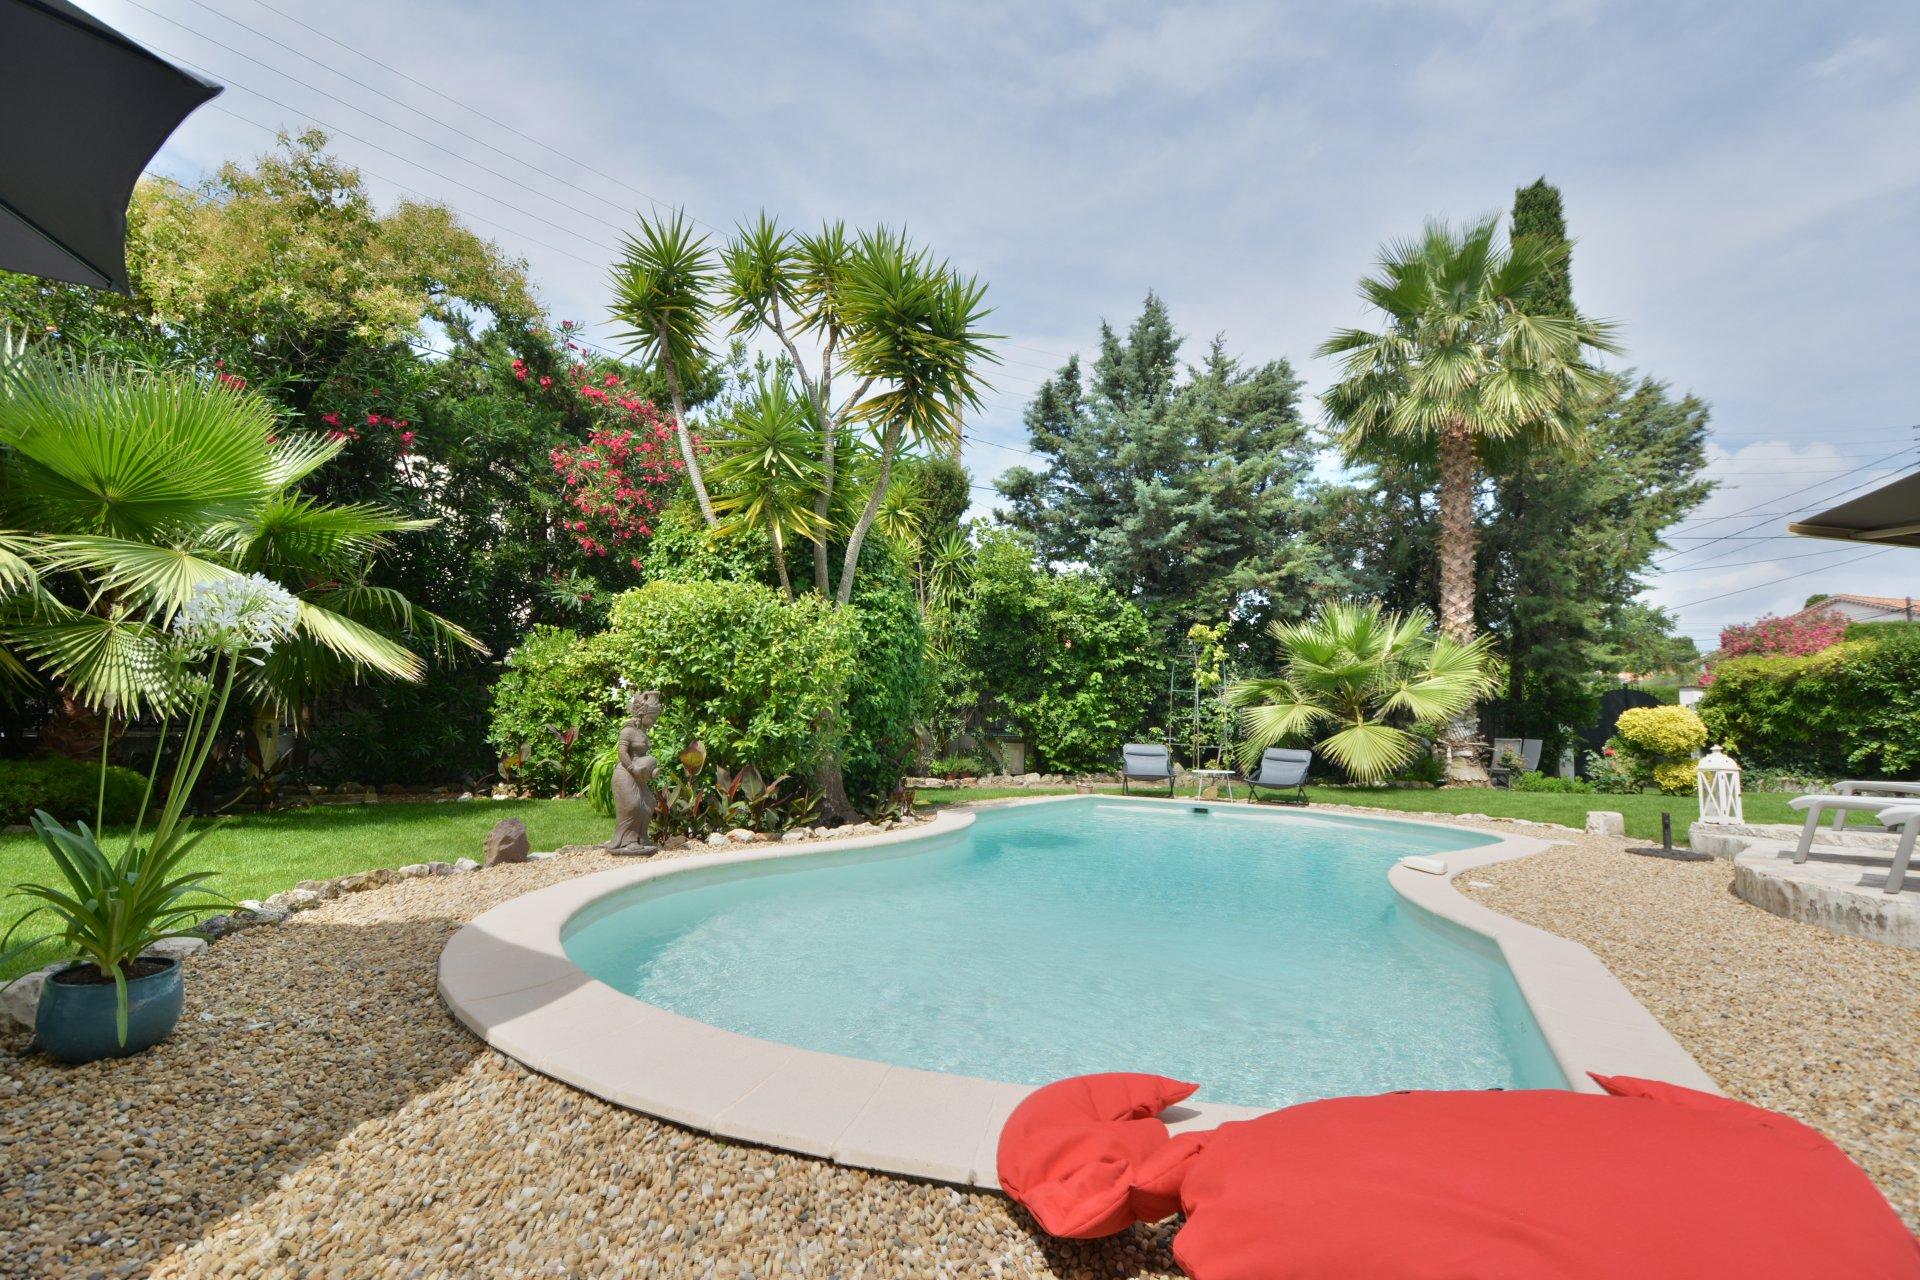 Вилла с бассейном - Жуан ле Пен